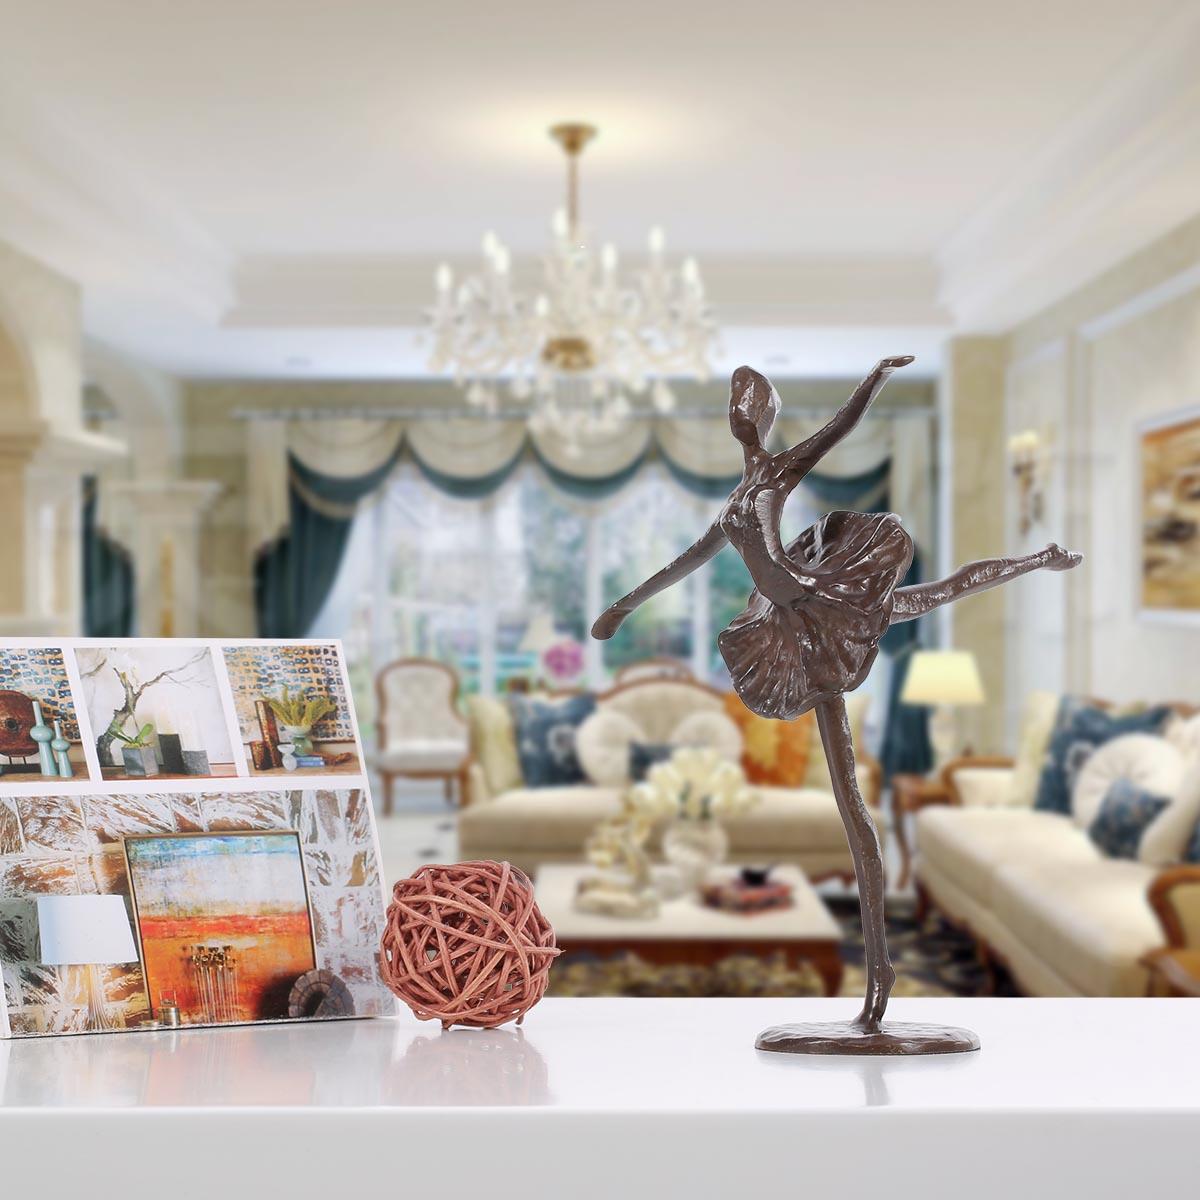 Best and cheap bronze ballet bronze sculpture metal for Best home decor gifts